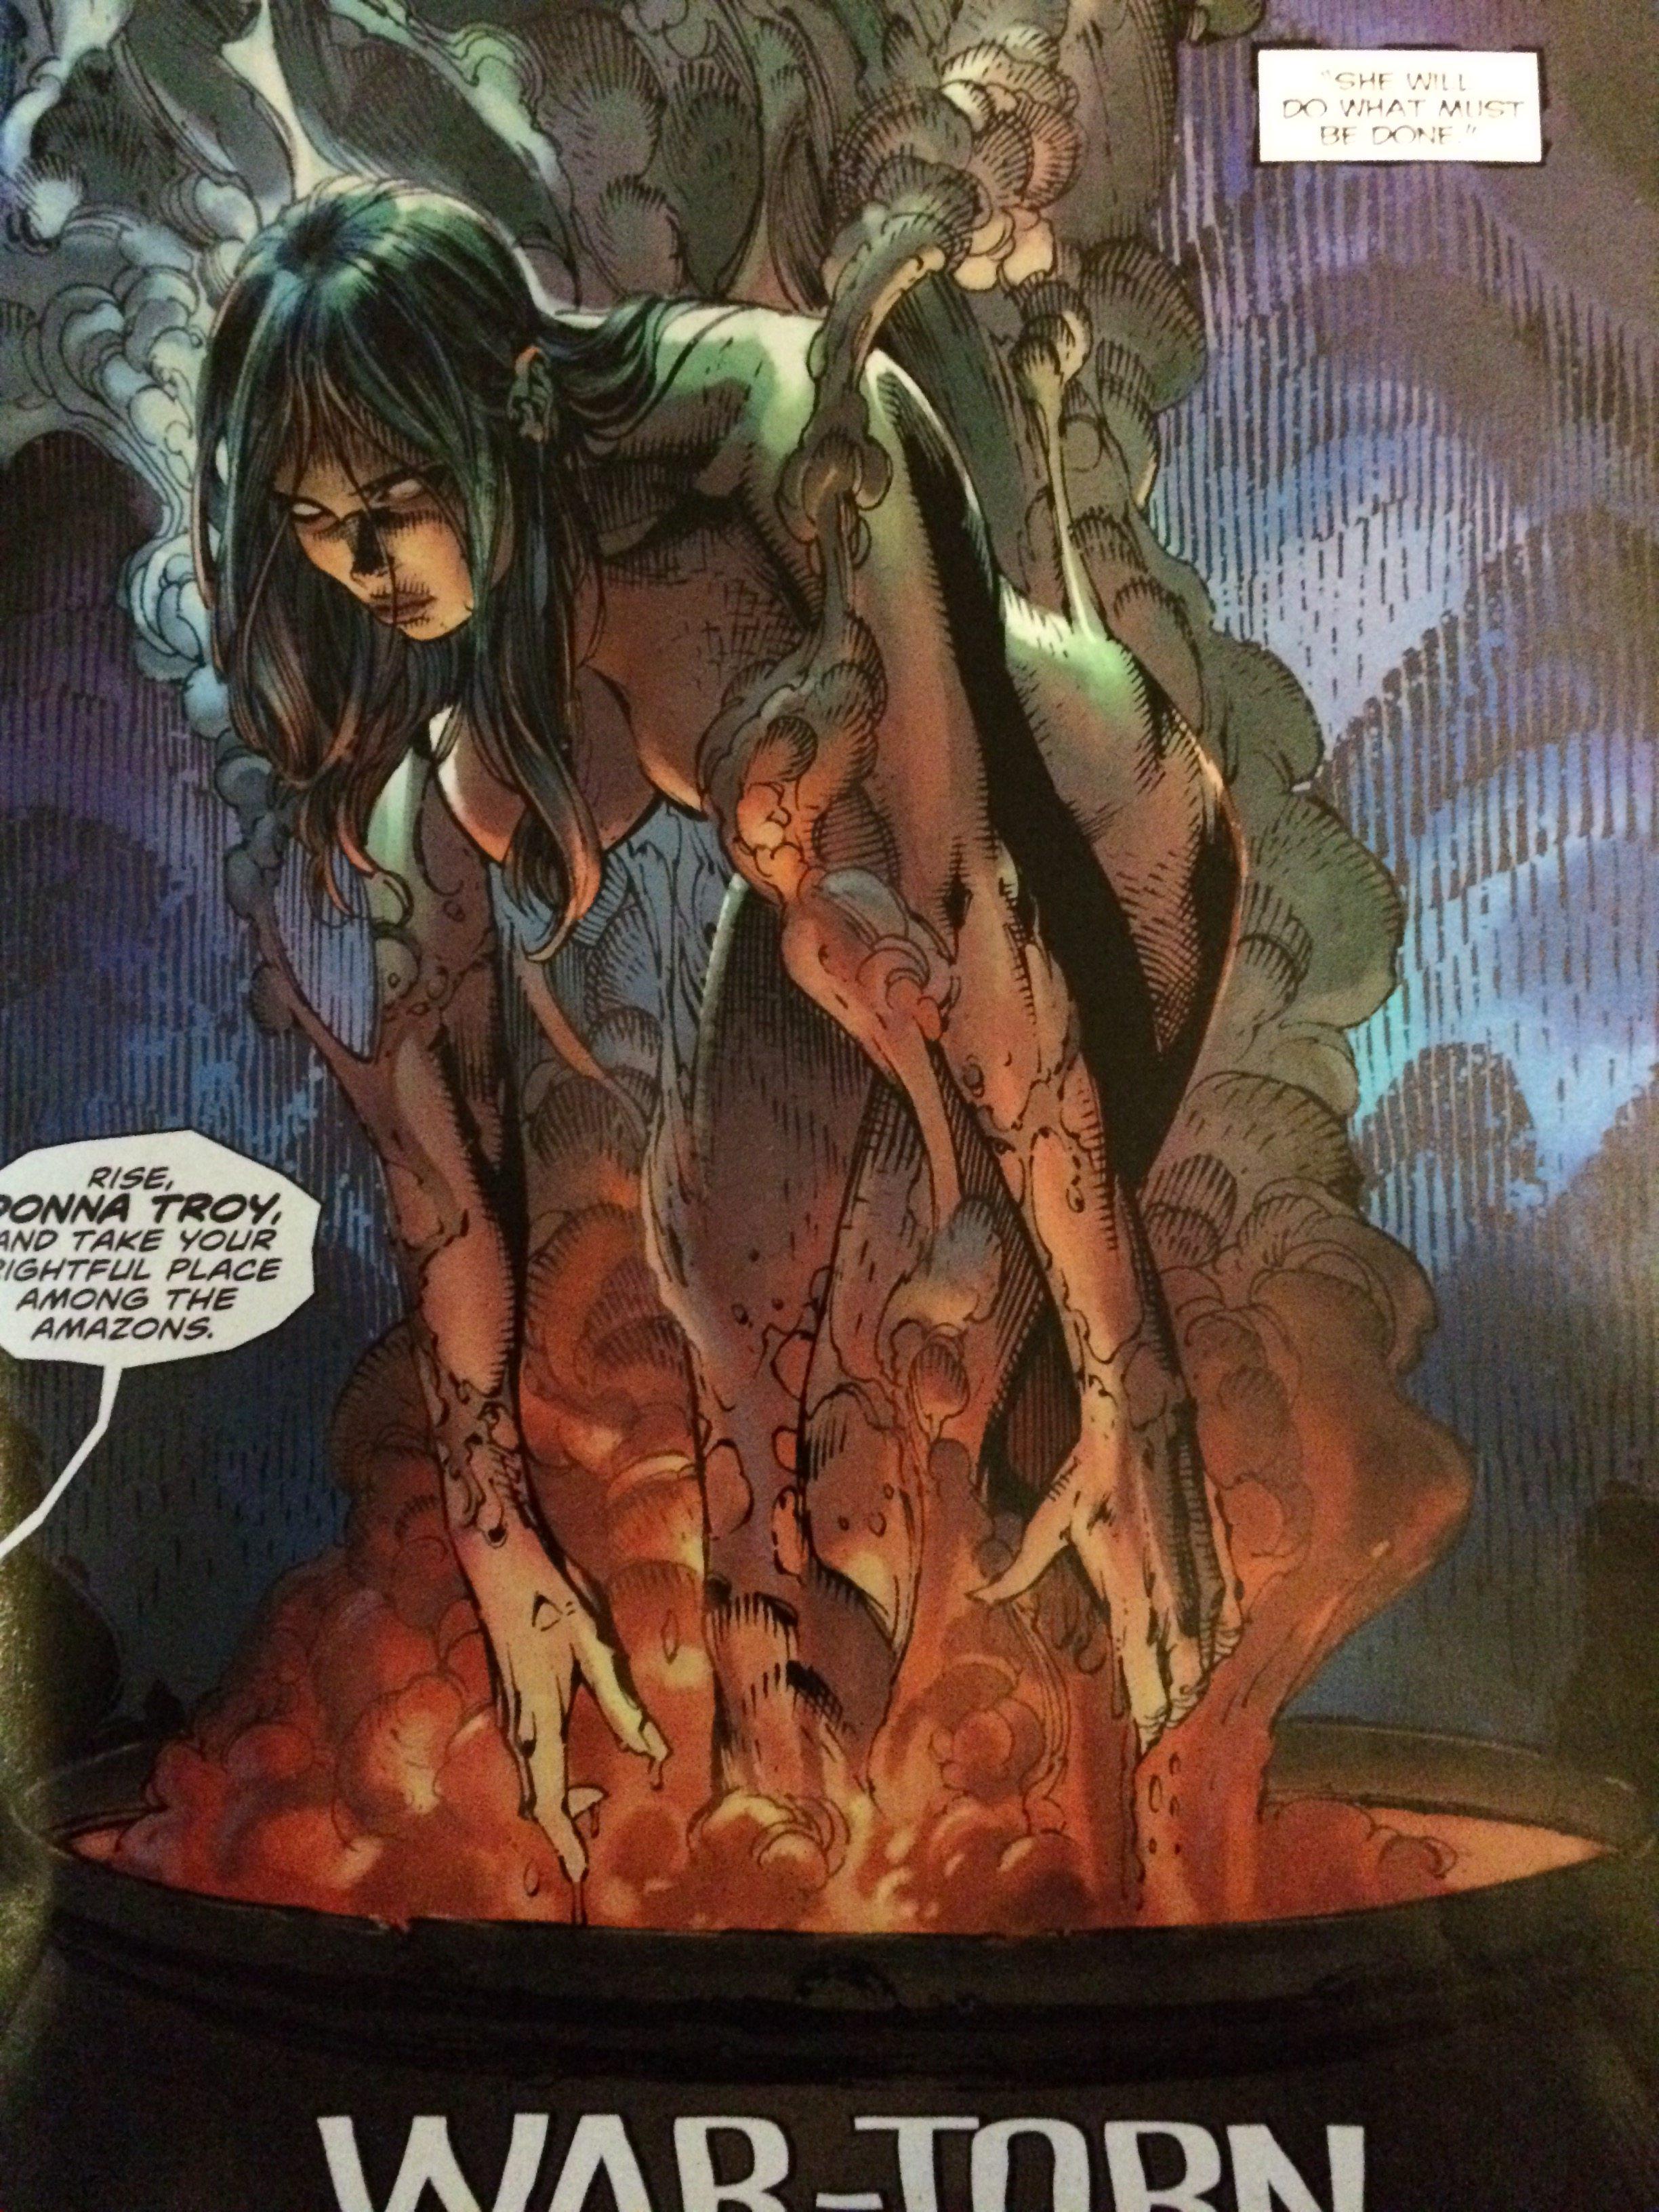 The castration of batman mistress lora style - 1 part 6